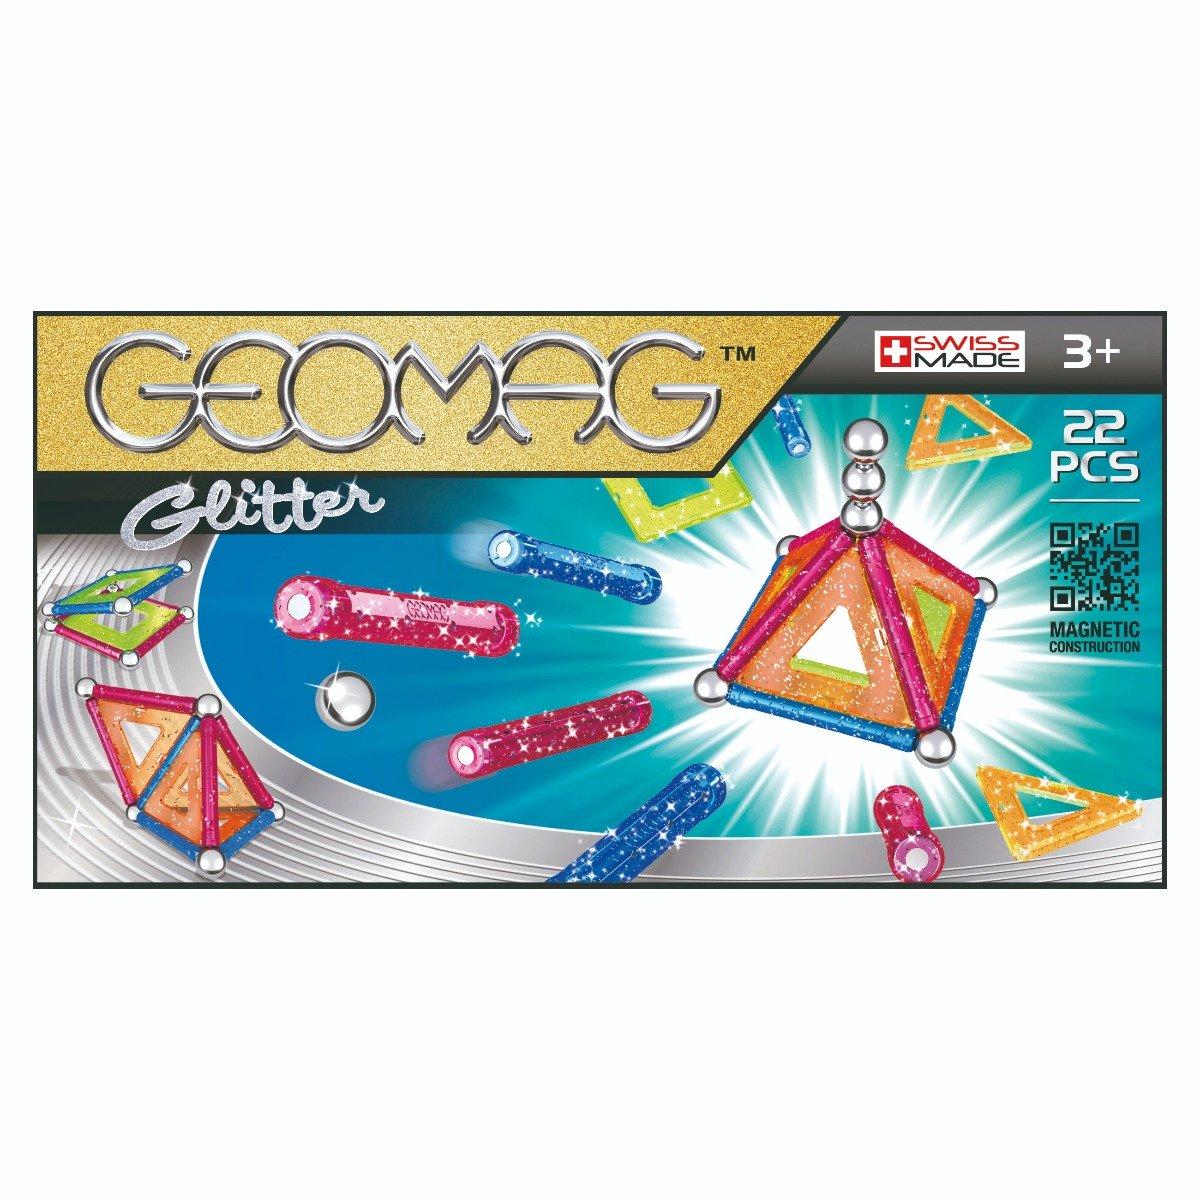 Joc de constructie magnetic Geomag Glitter, 22 piese